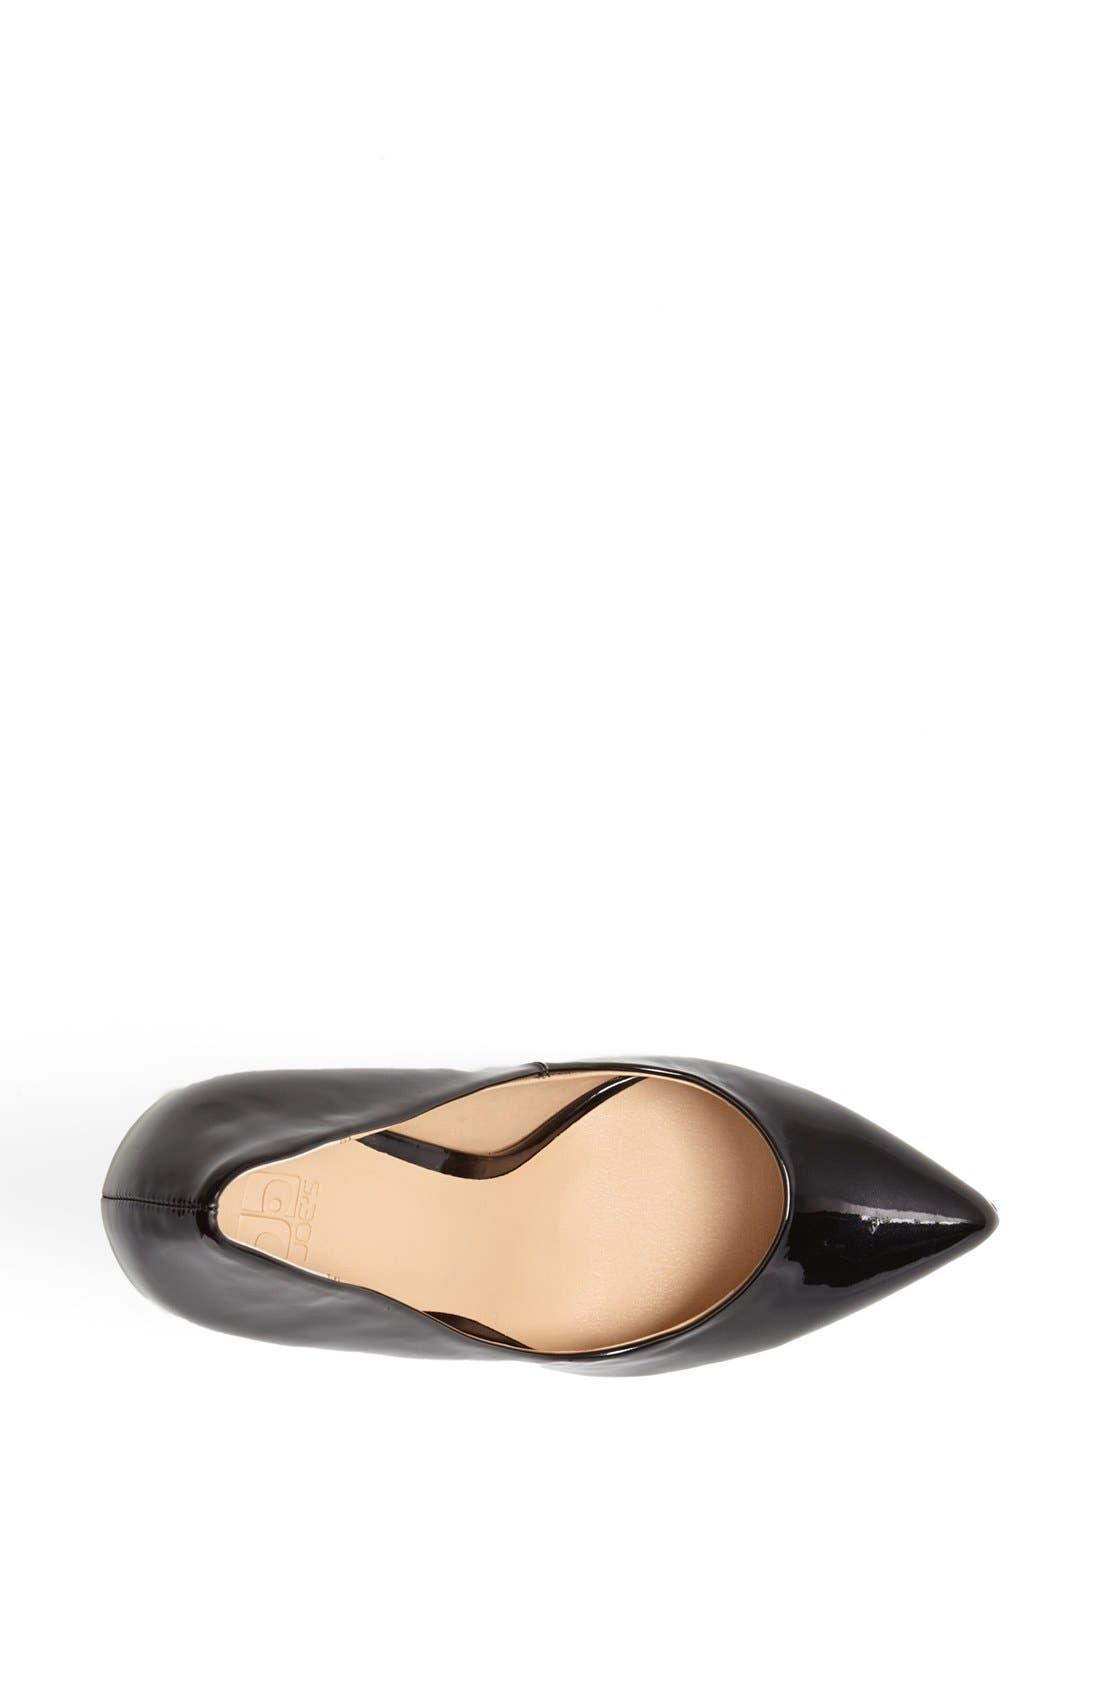 Alternate Image 3  - Joe's 'Erika' Patent Leather Pointy Toe Pump